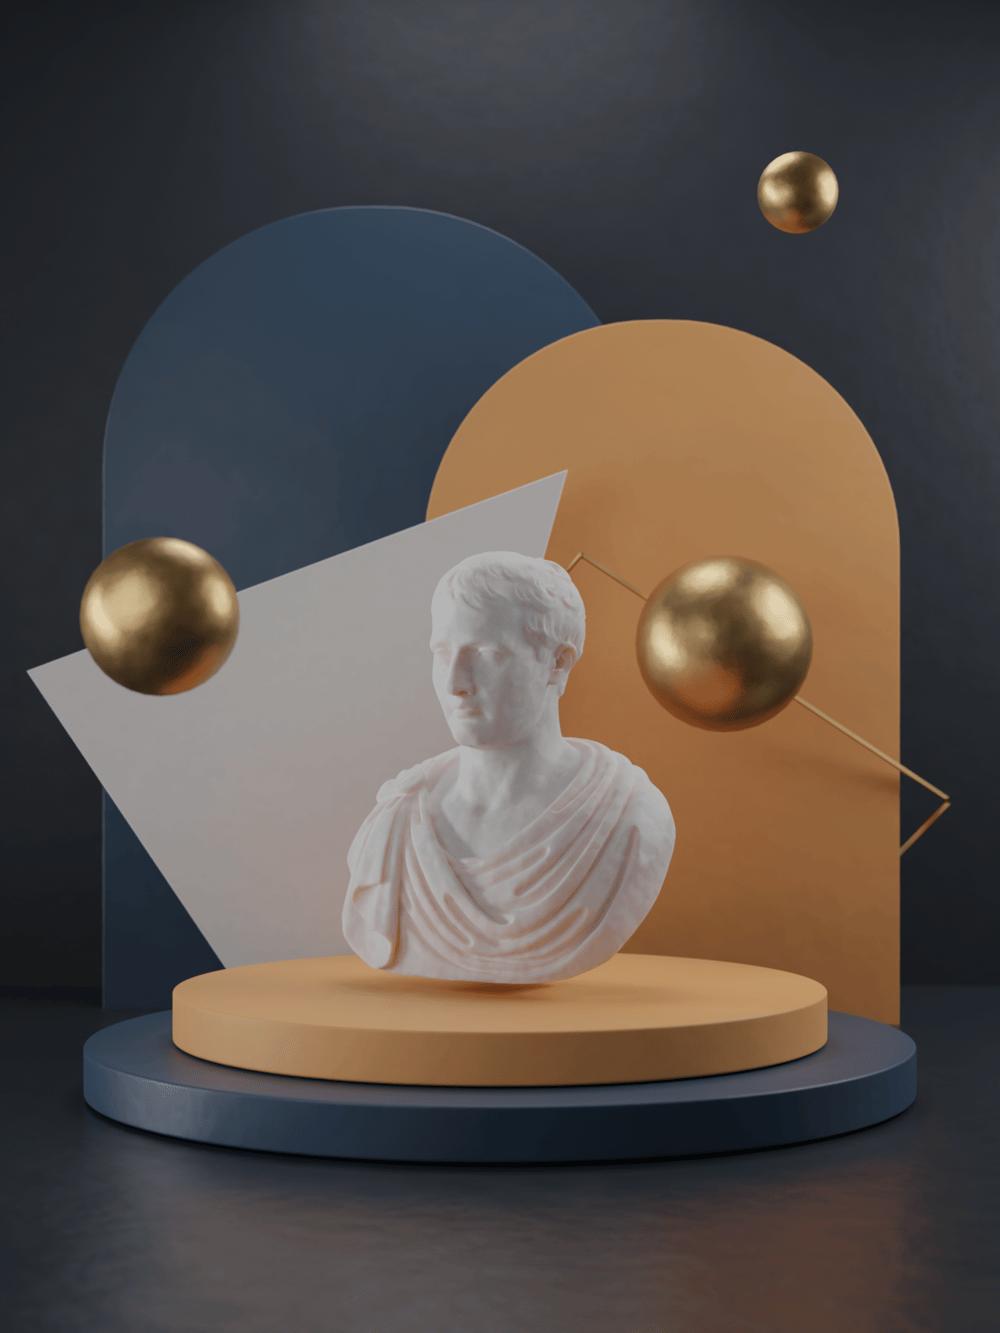 Retro Napoleon - image 1 - student project